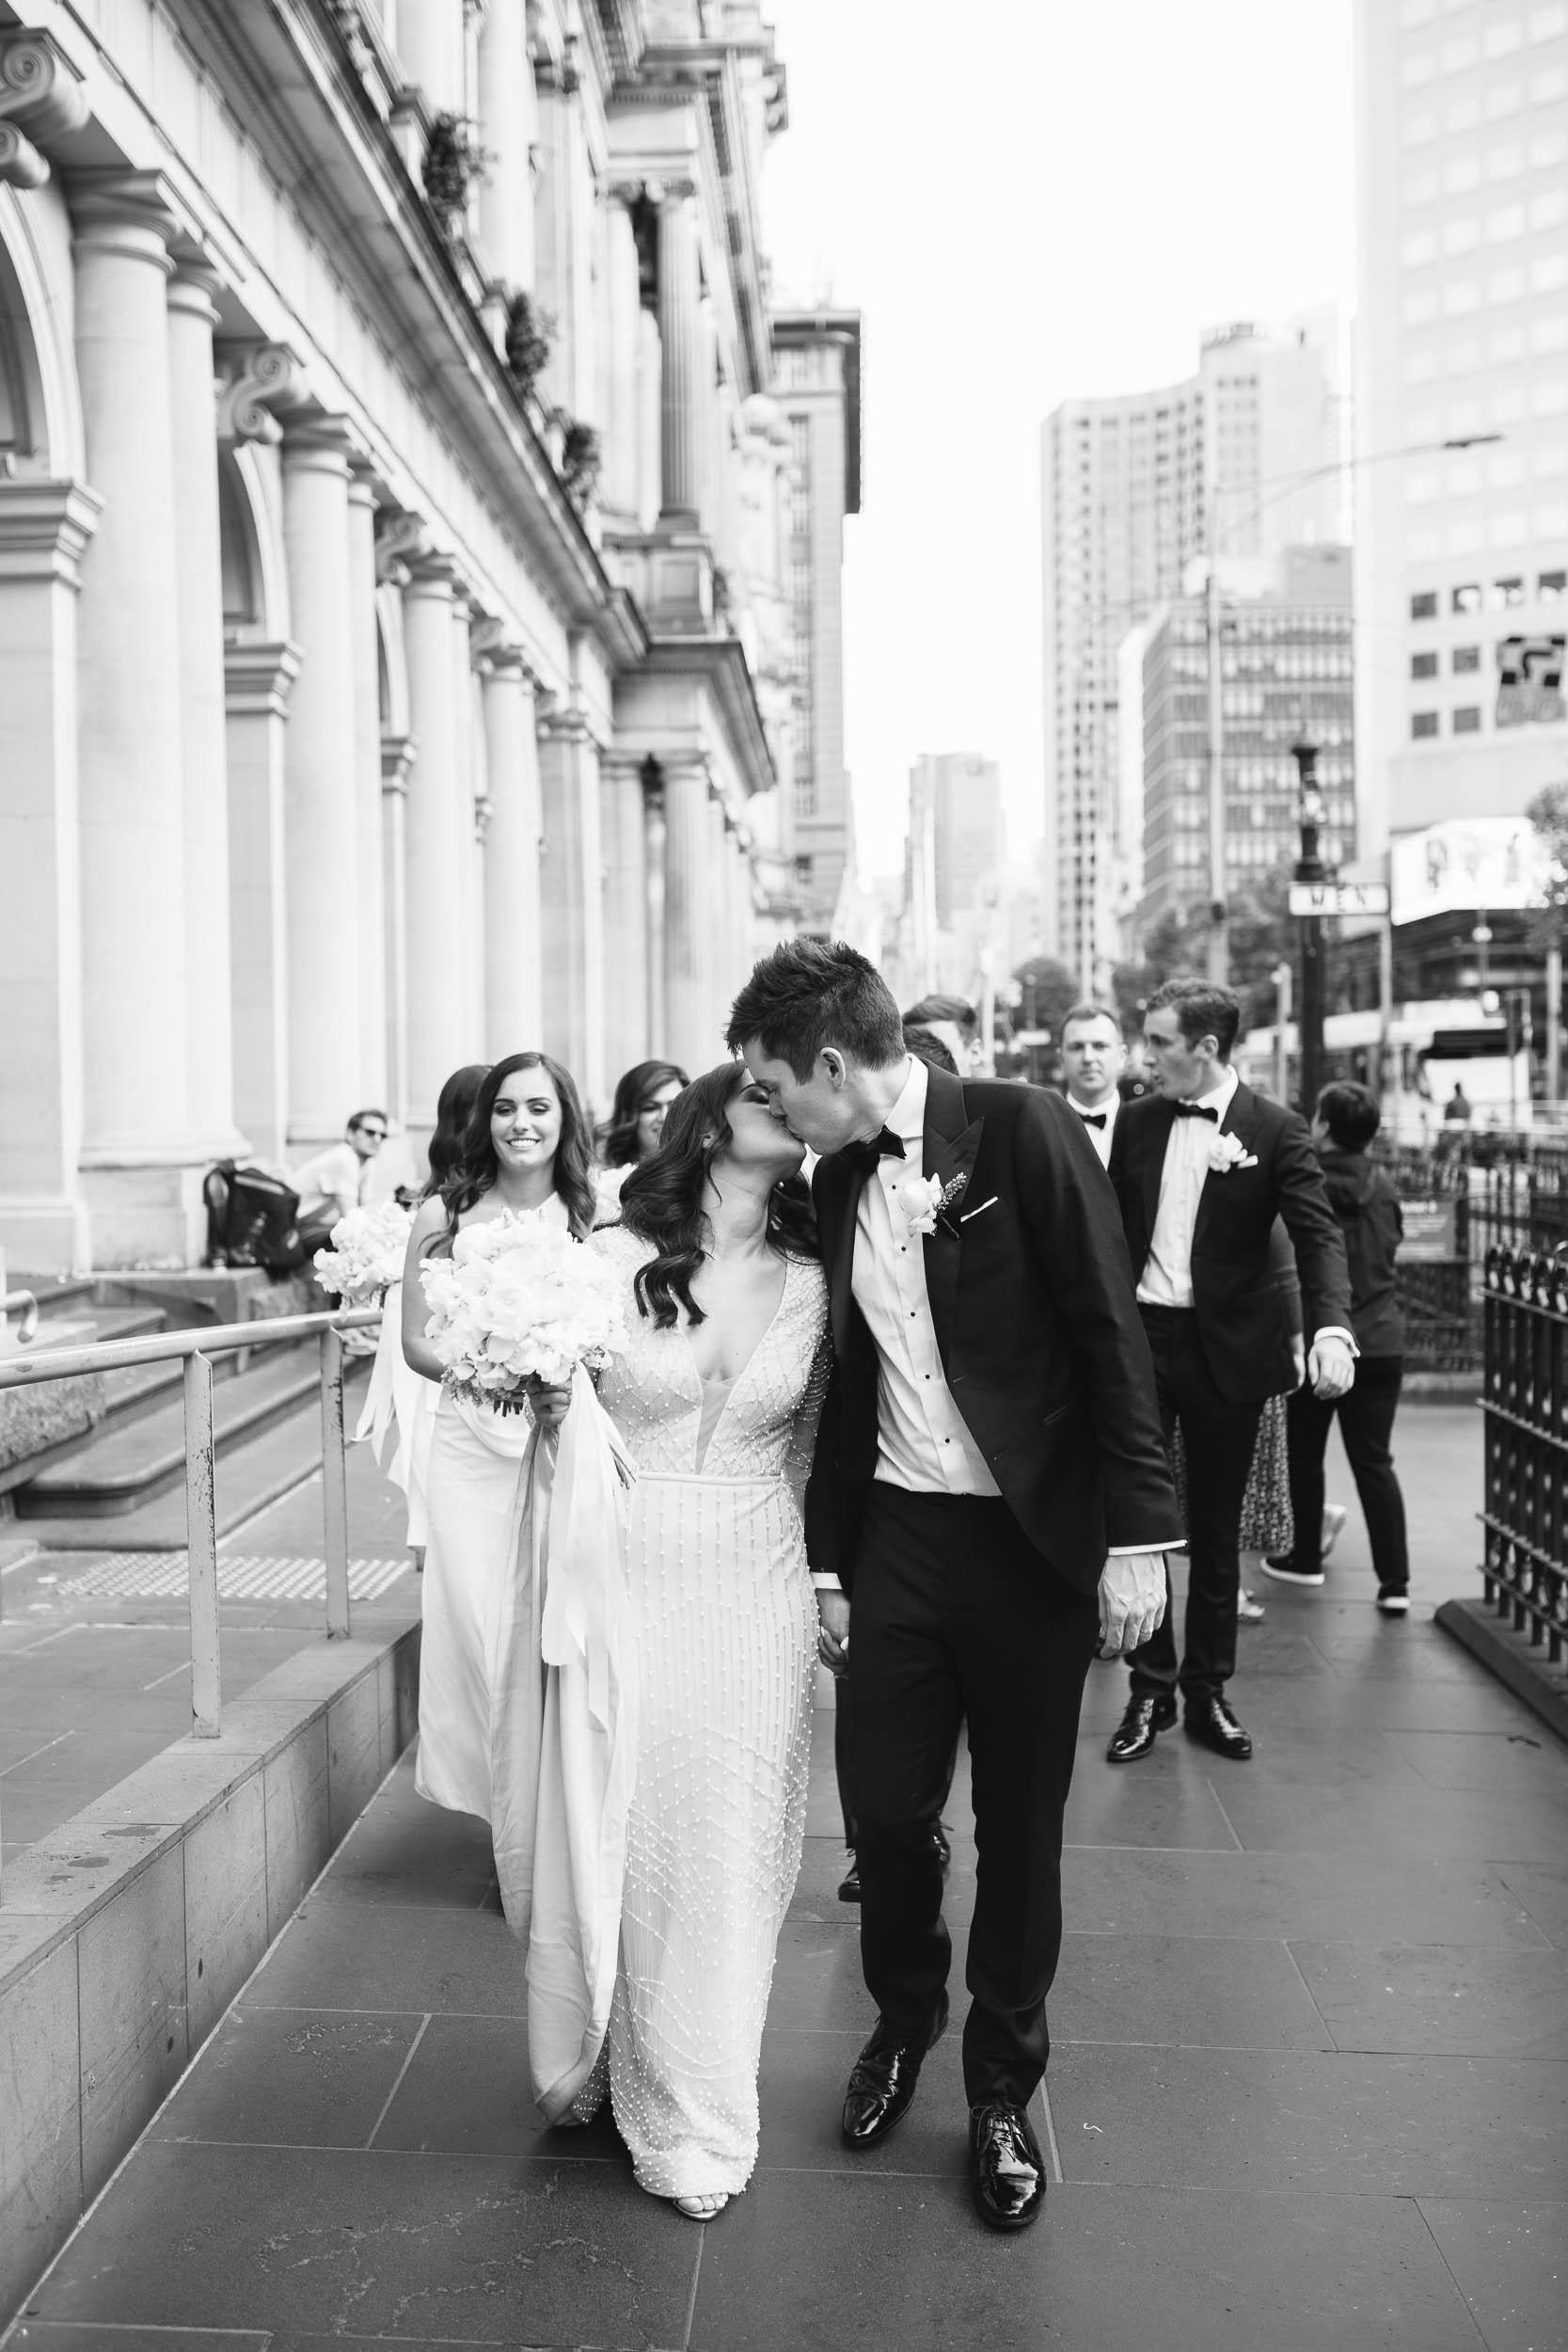 Kas-Richards-Wedding-Photographer-Melbourne-City-Wedding-Alto-Event-Space-Jane-Hill-Bridal-Gown-51.jpg